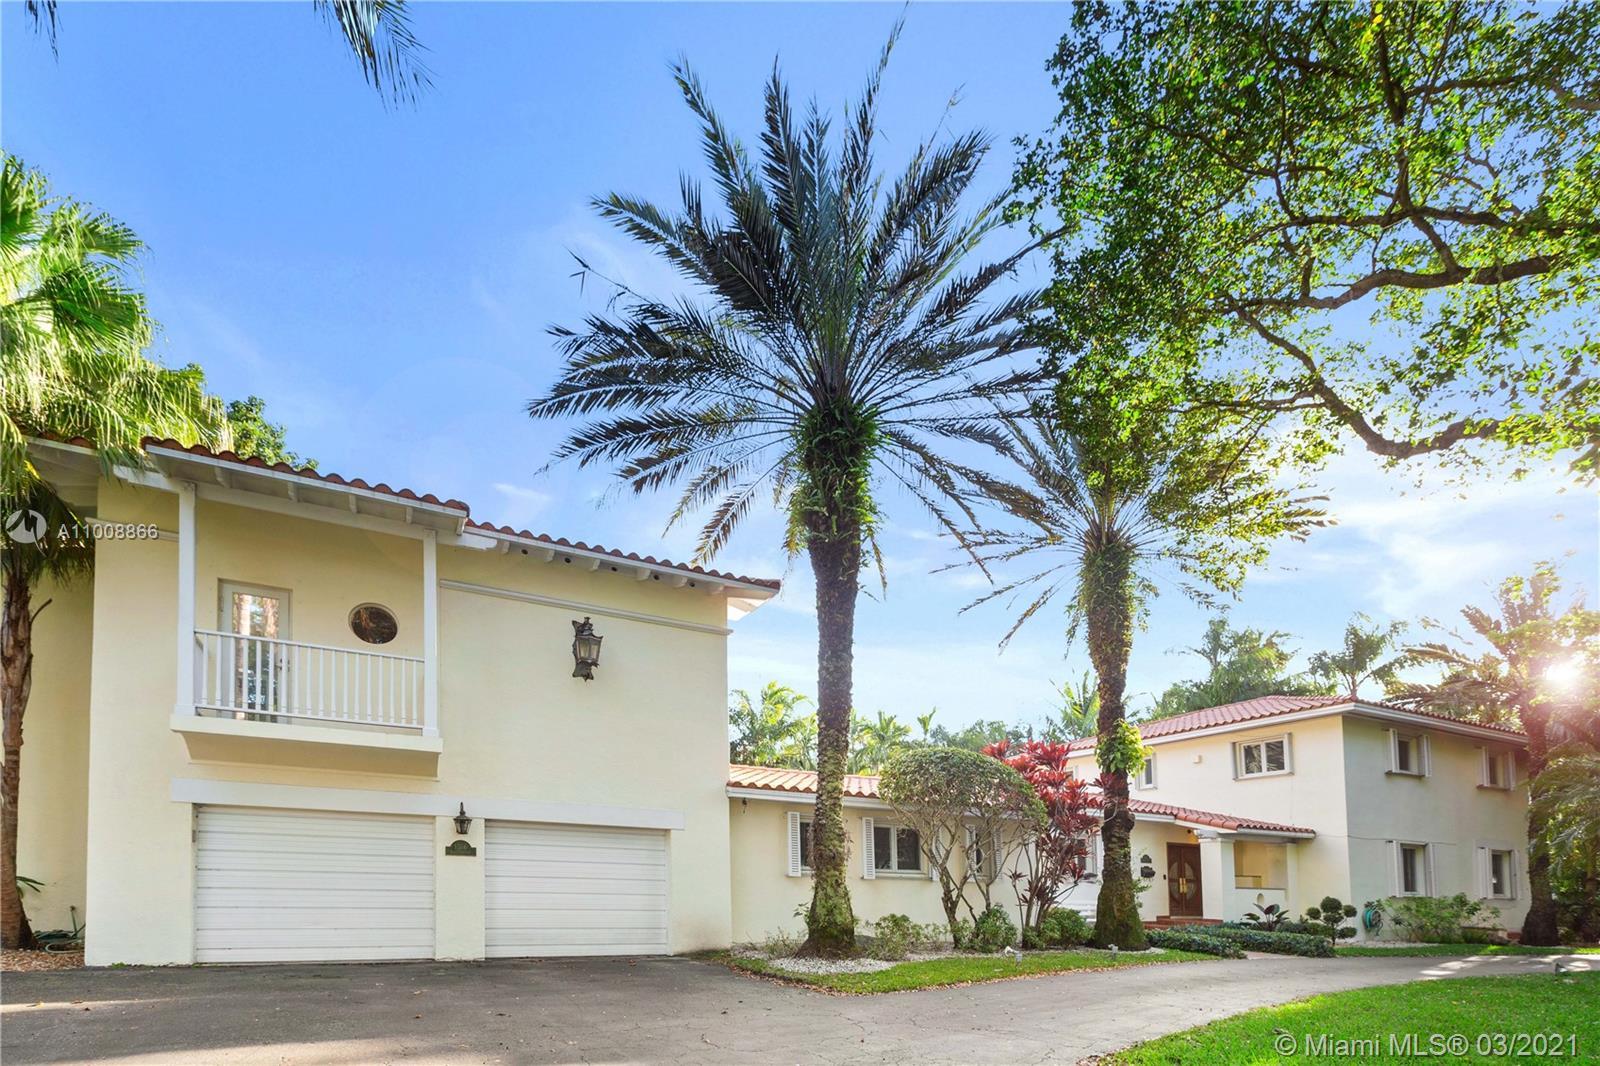 South Miami - 1516 Garcia Ave, Coral Gables, FL 33146